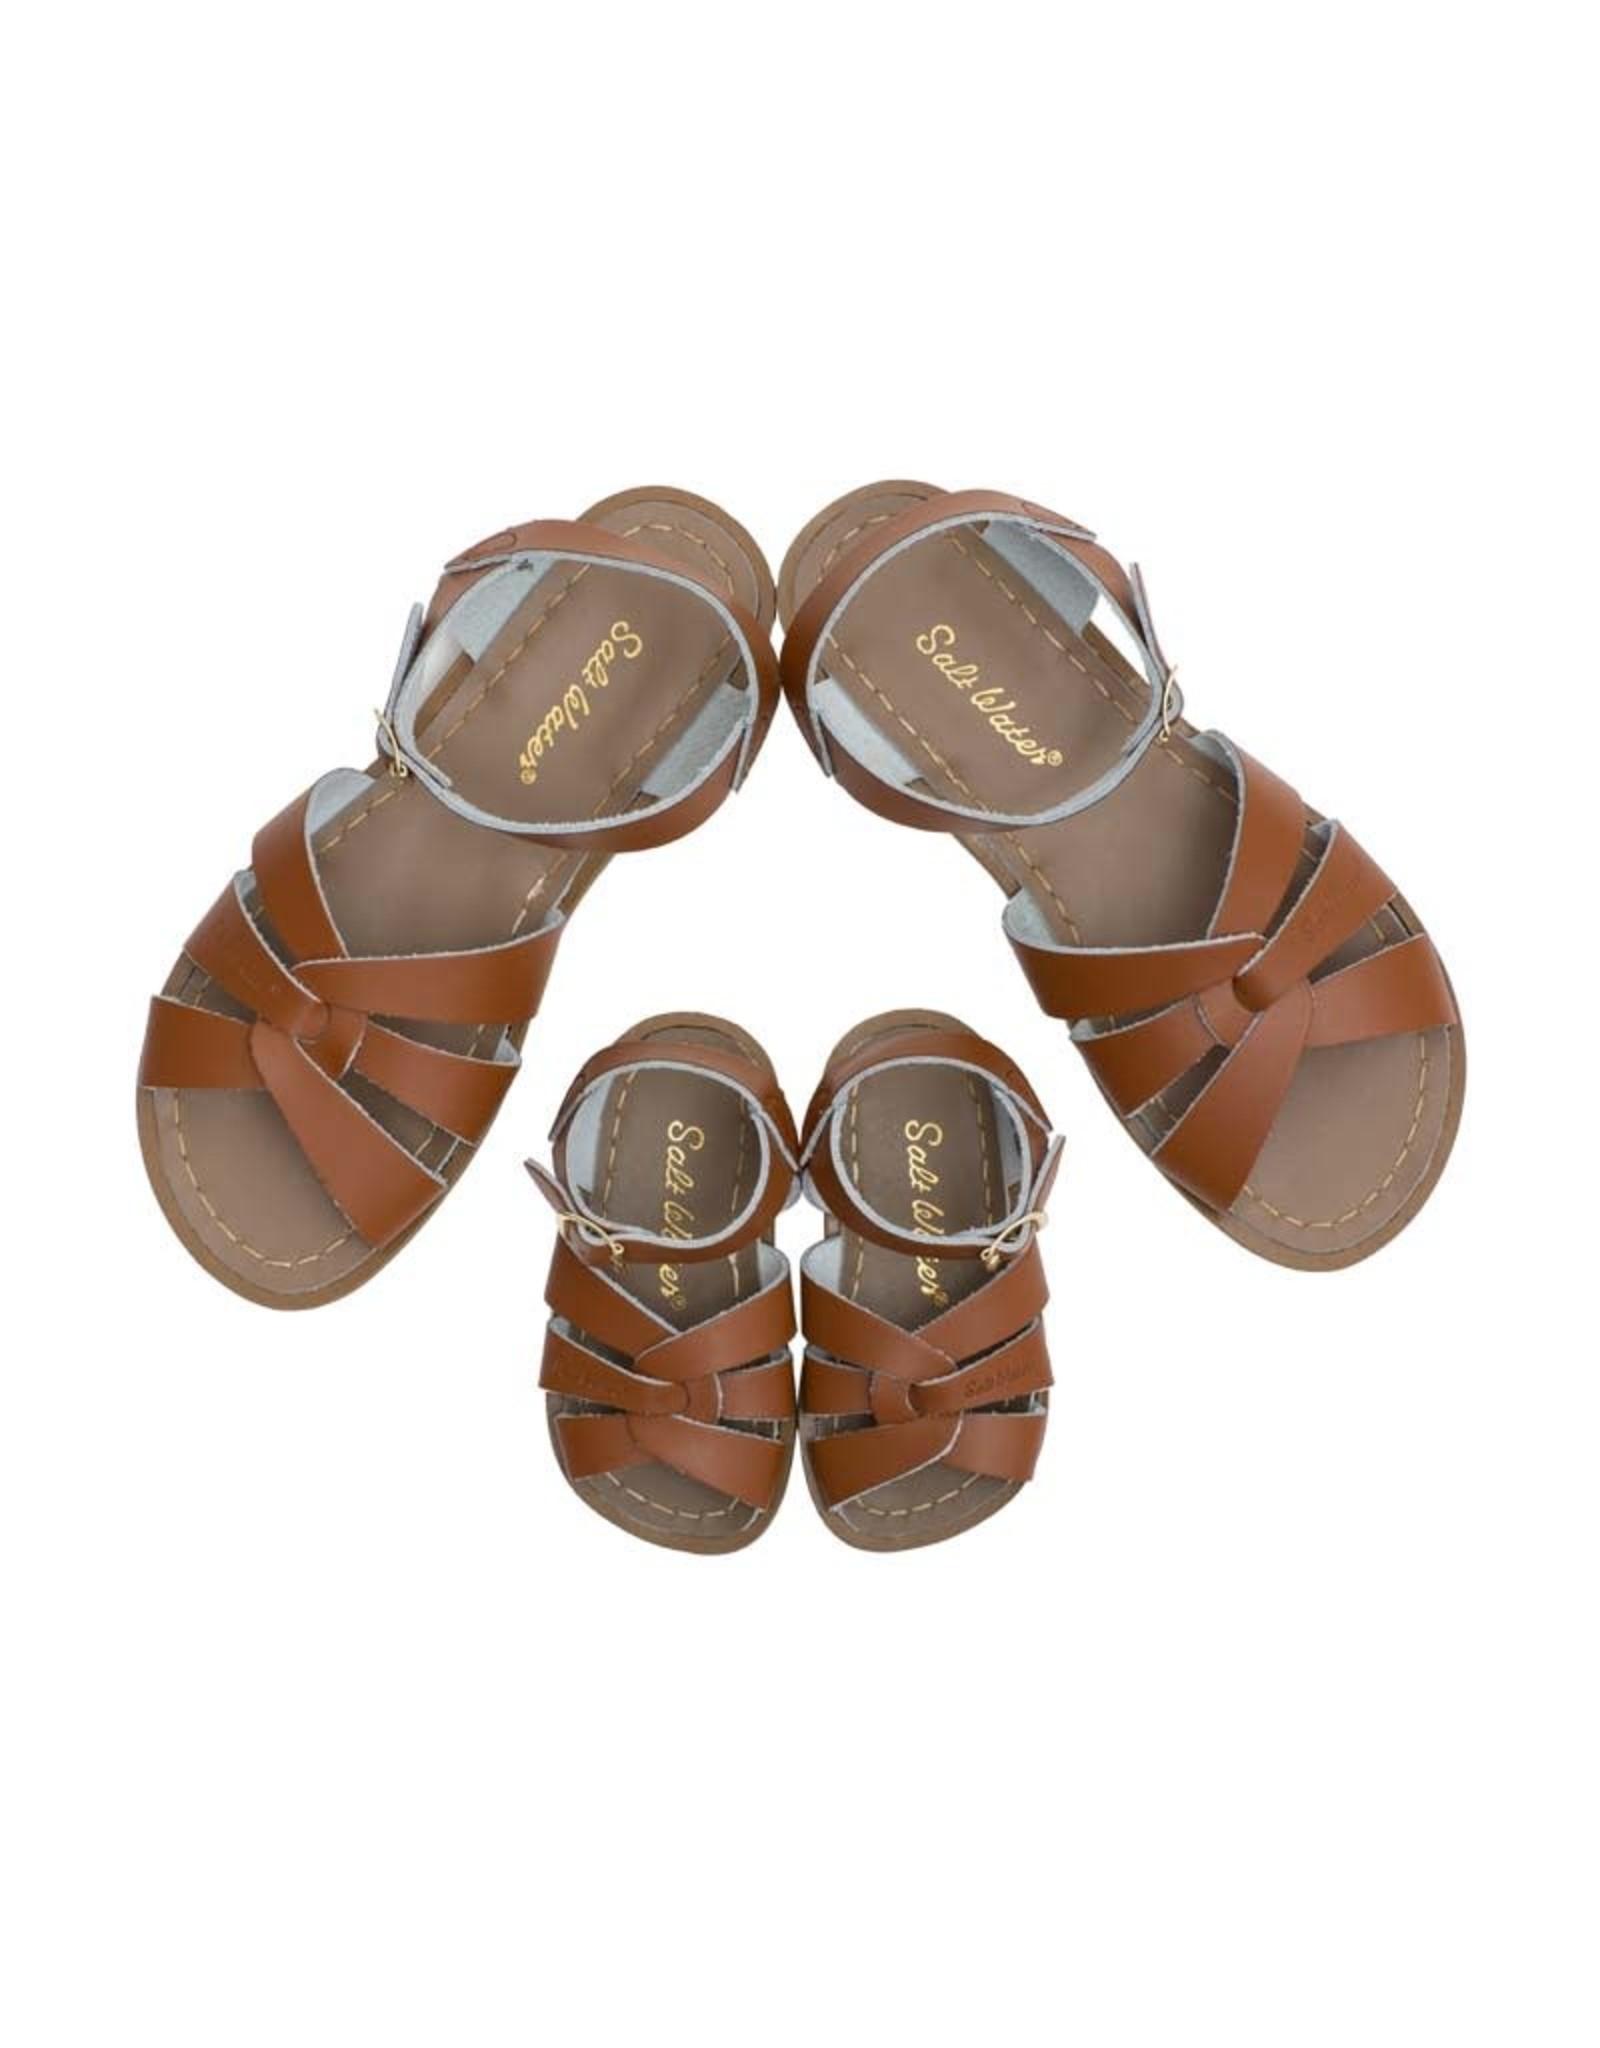 Salt Water Sandals original tan